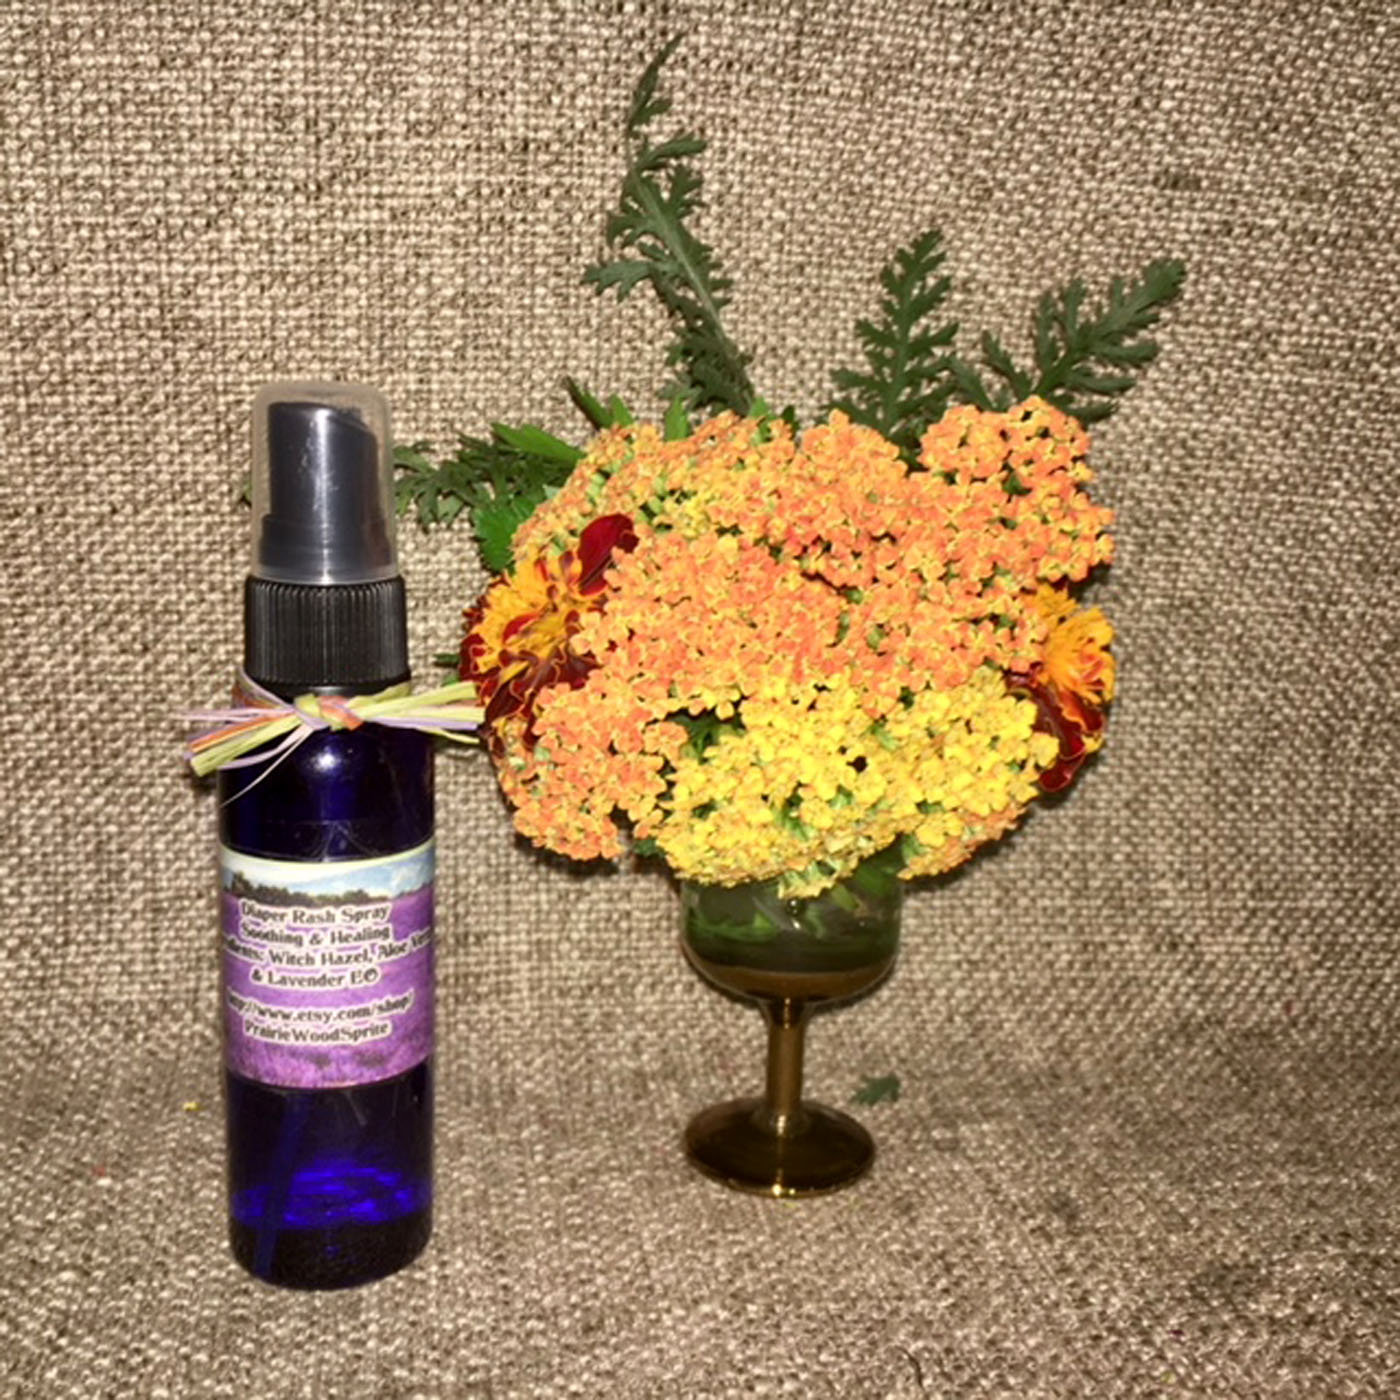 Diaper Rash Spray Formula #6, 2-4oz Cleanse Moisturize Balance pH Soothe Heal Ba image 3